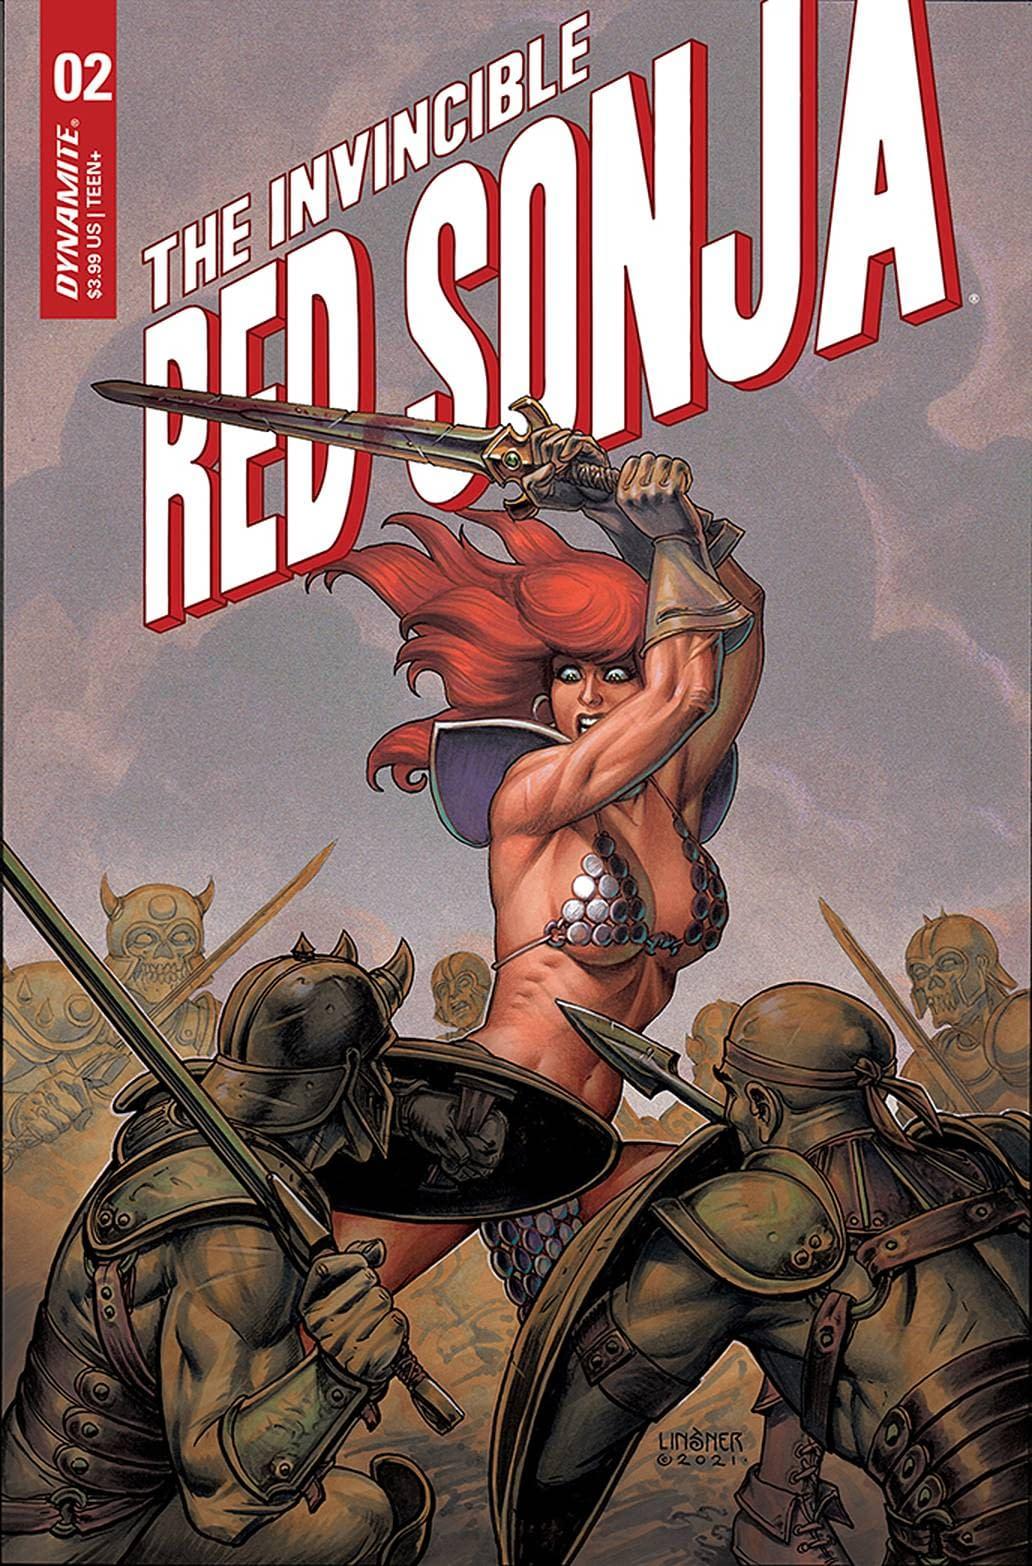 INVINCIBLE RED SONJA #2 CVR B LINSNER